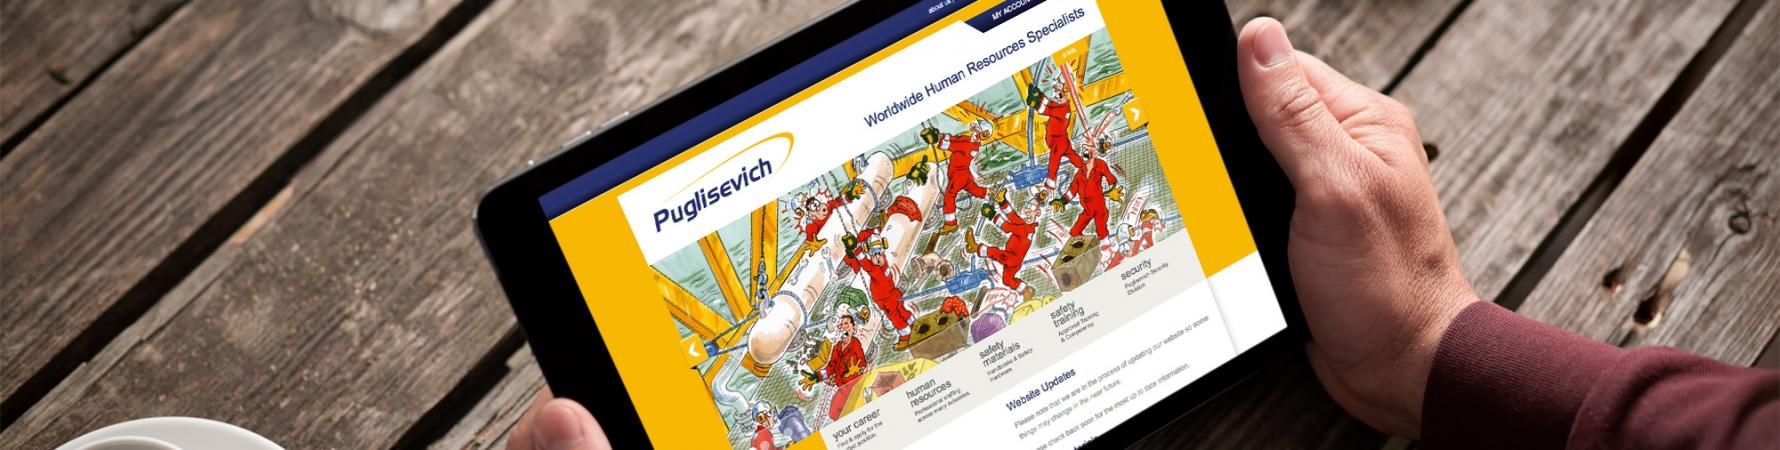 Eesponsive mobile website design - Puglisevich